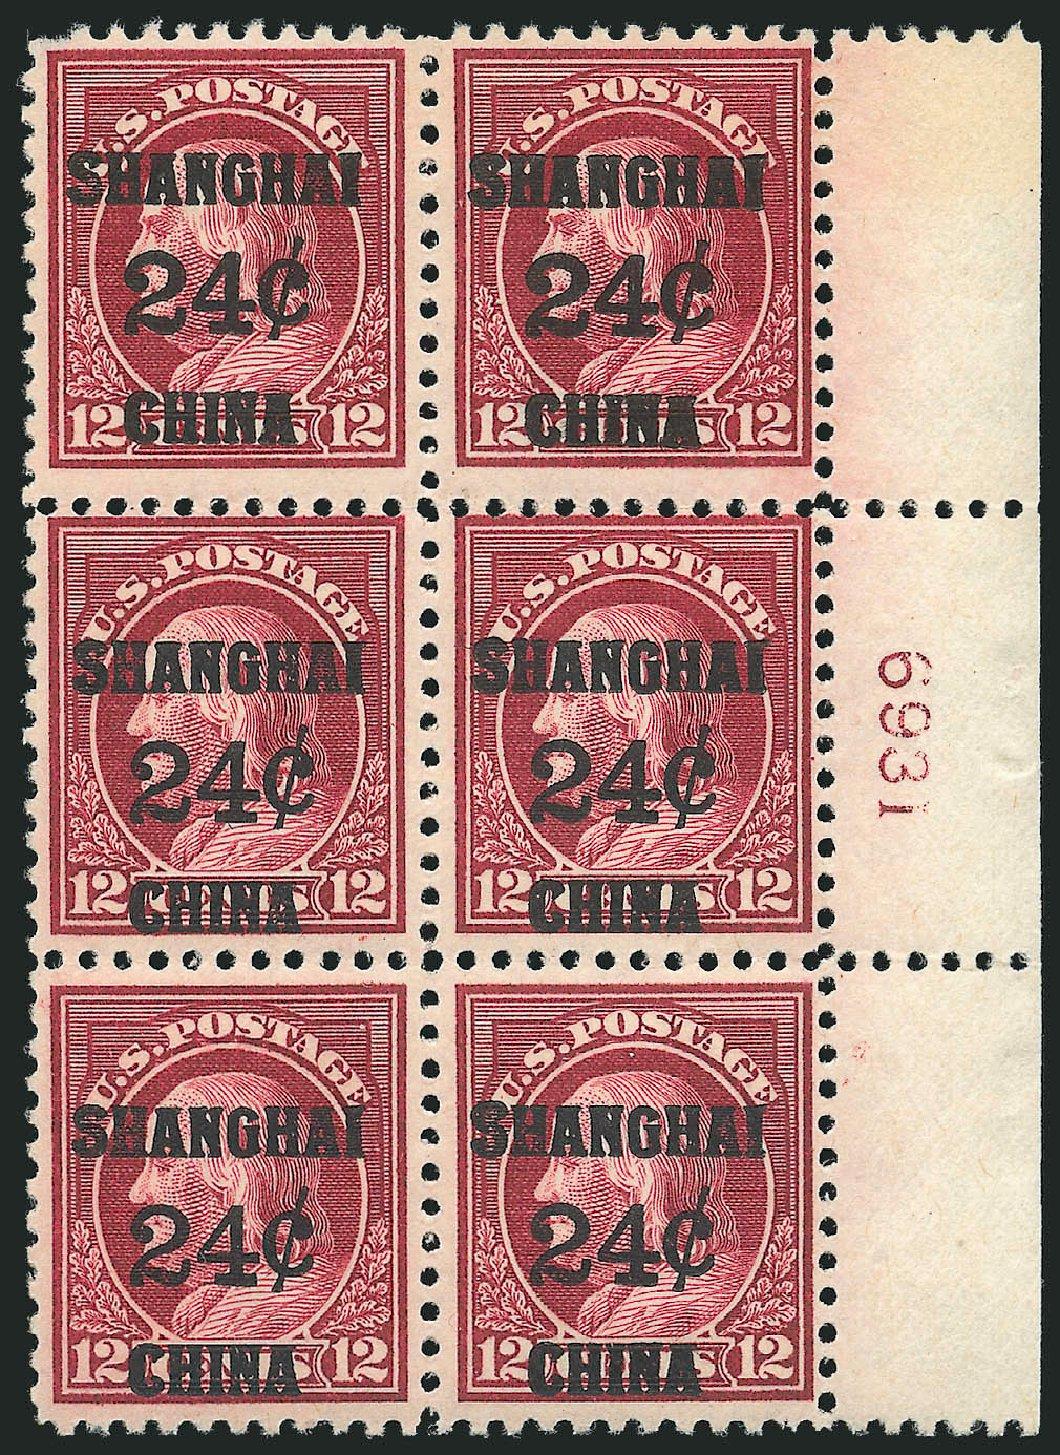 Prices of US Stamp Scott Catalogue K11 - 24c 1919 China Shanghai on 12c. Robert Siegel Auction Galleries, Apr 2015, Sale 1096, Lot 881